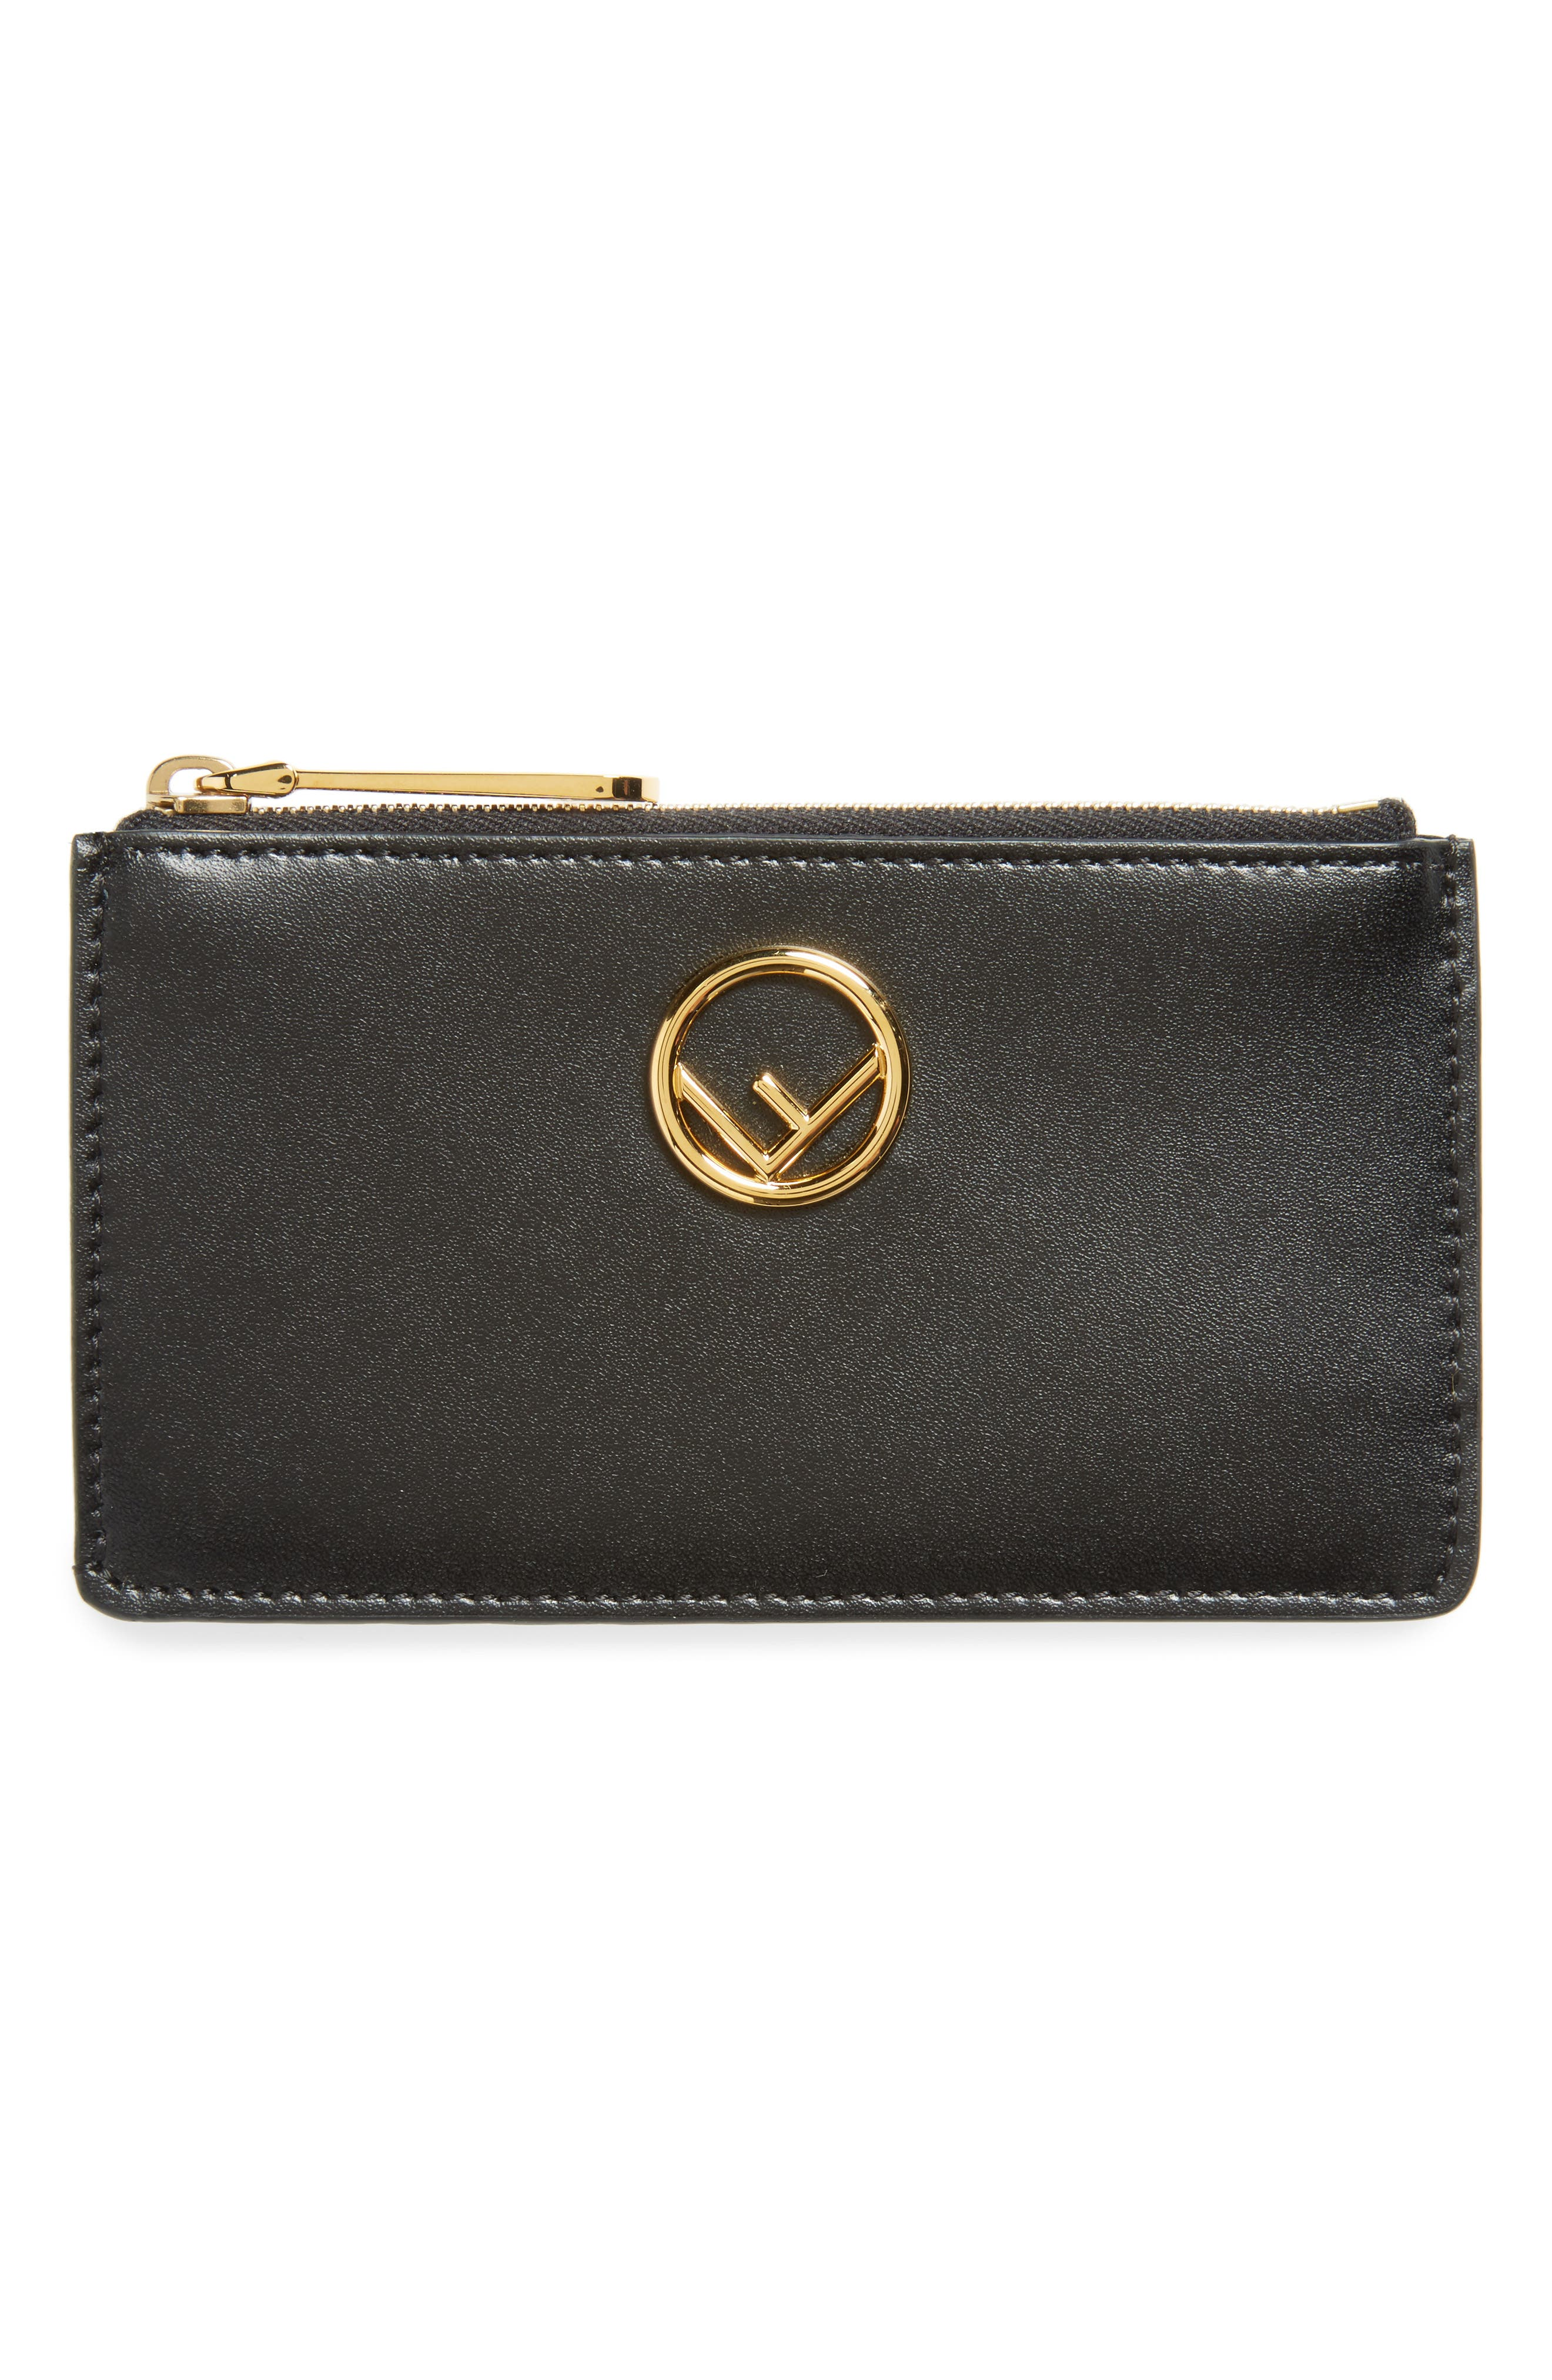 Leather Card Case,                             Main thumbnail 1, color,                             Nero/ Oro Soft